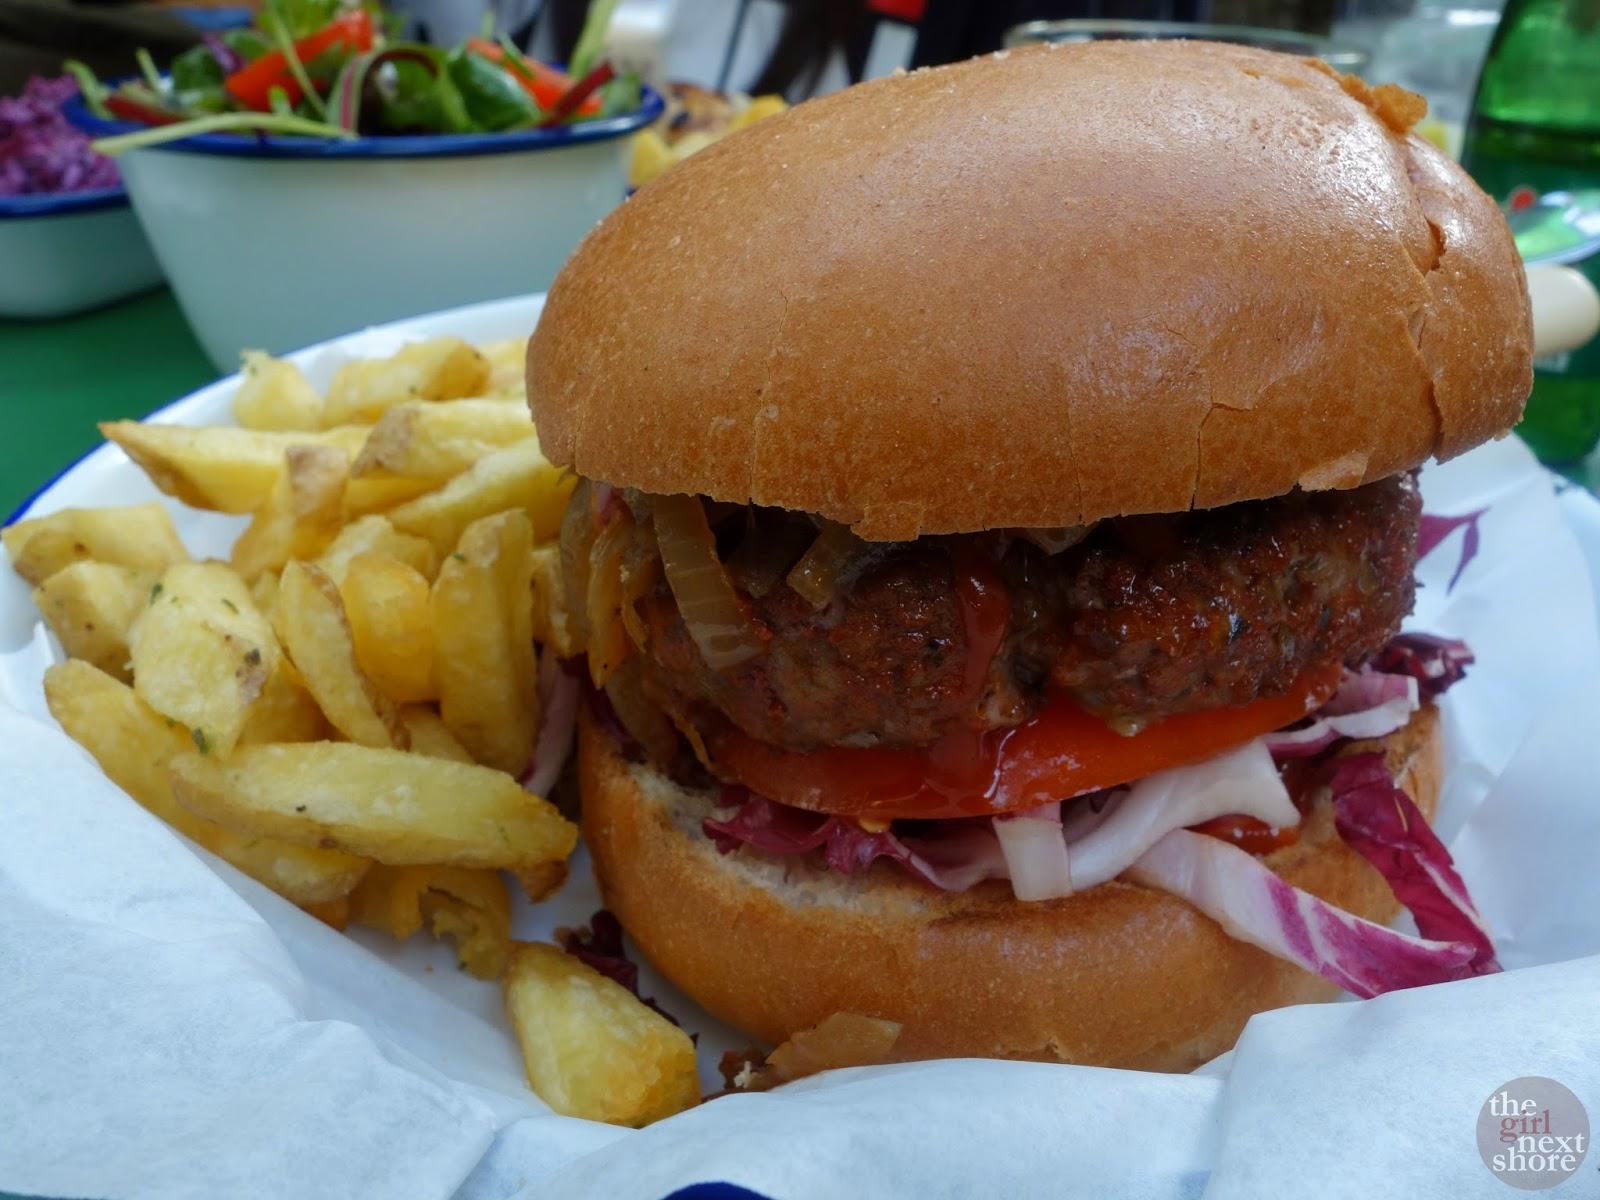 Honest Burgers Brixton Village: where I went down Louisiana way